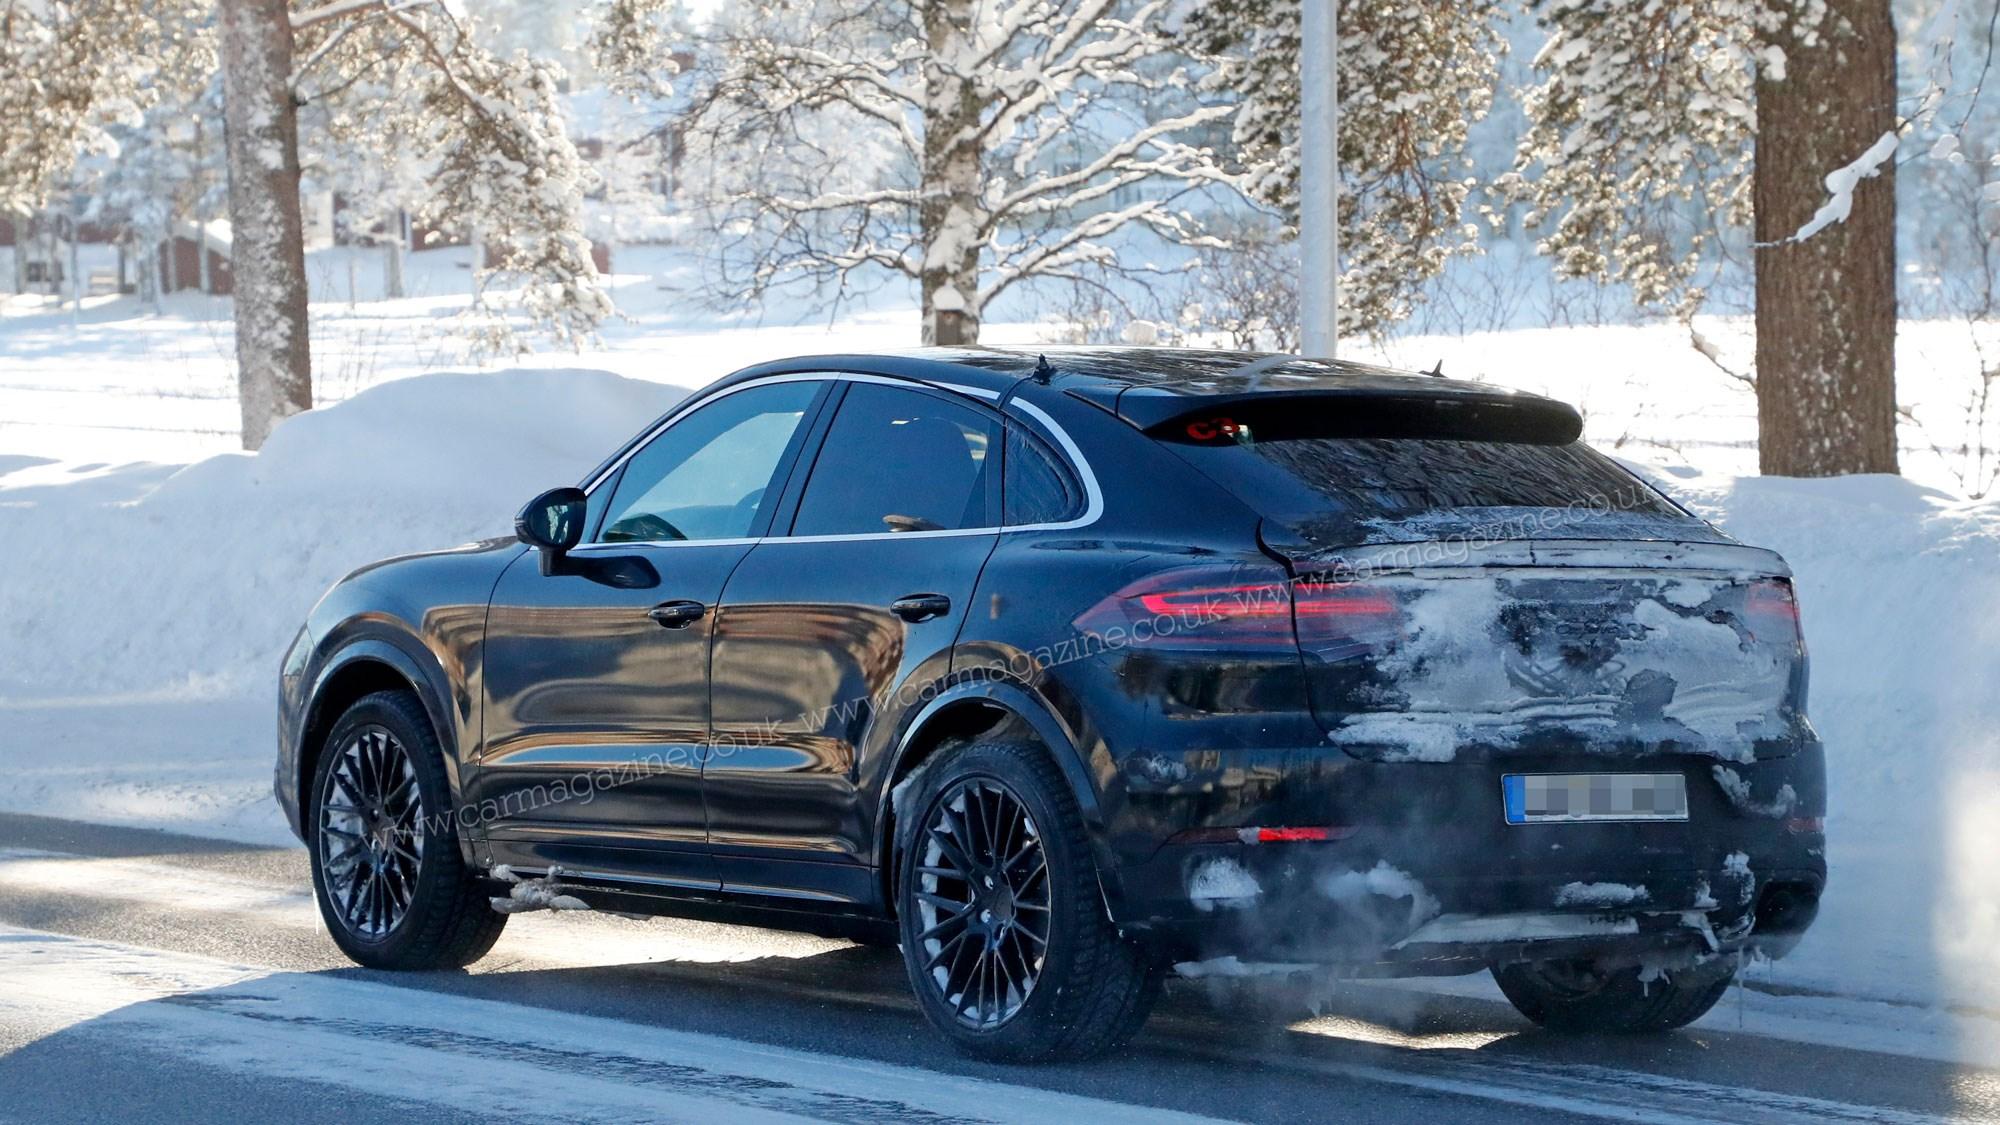 Porsche Cayenne Coupe Sporty Suv Spotted Winter Testing Car Magazine